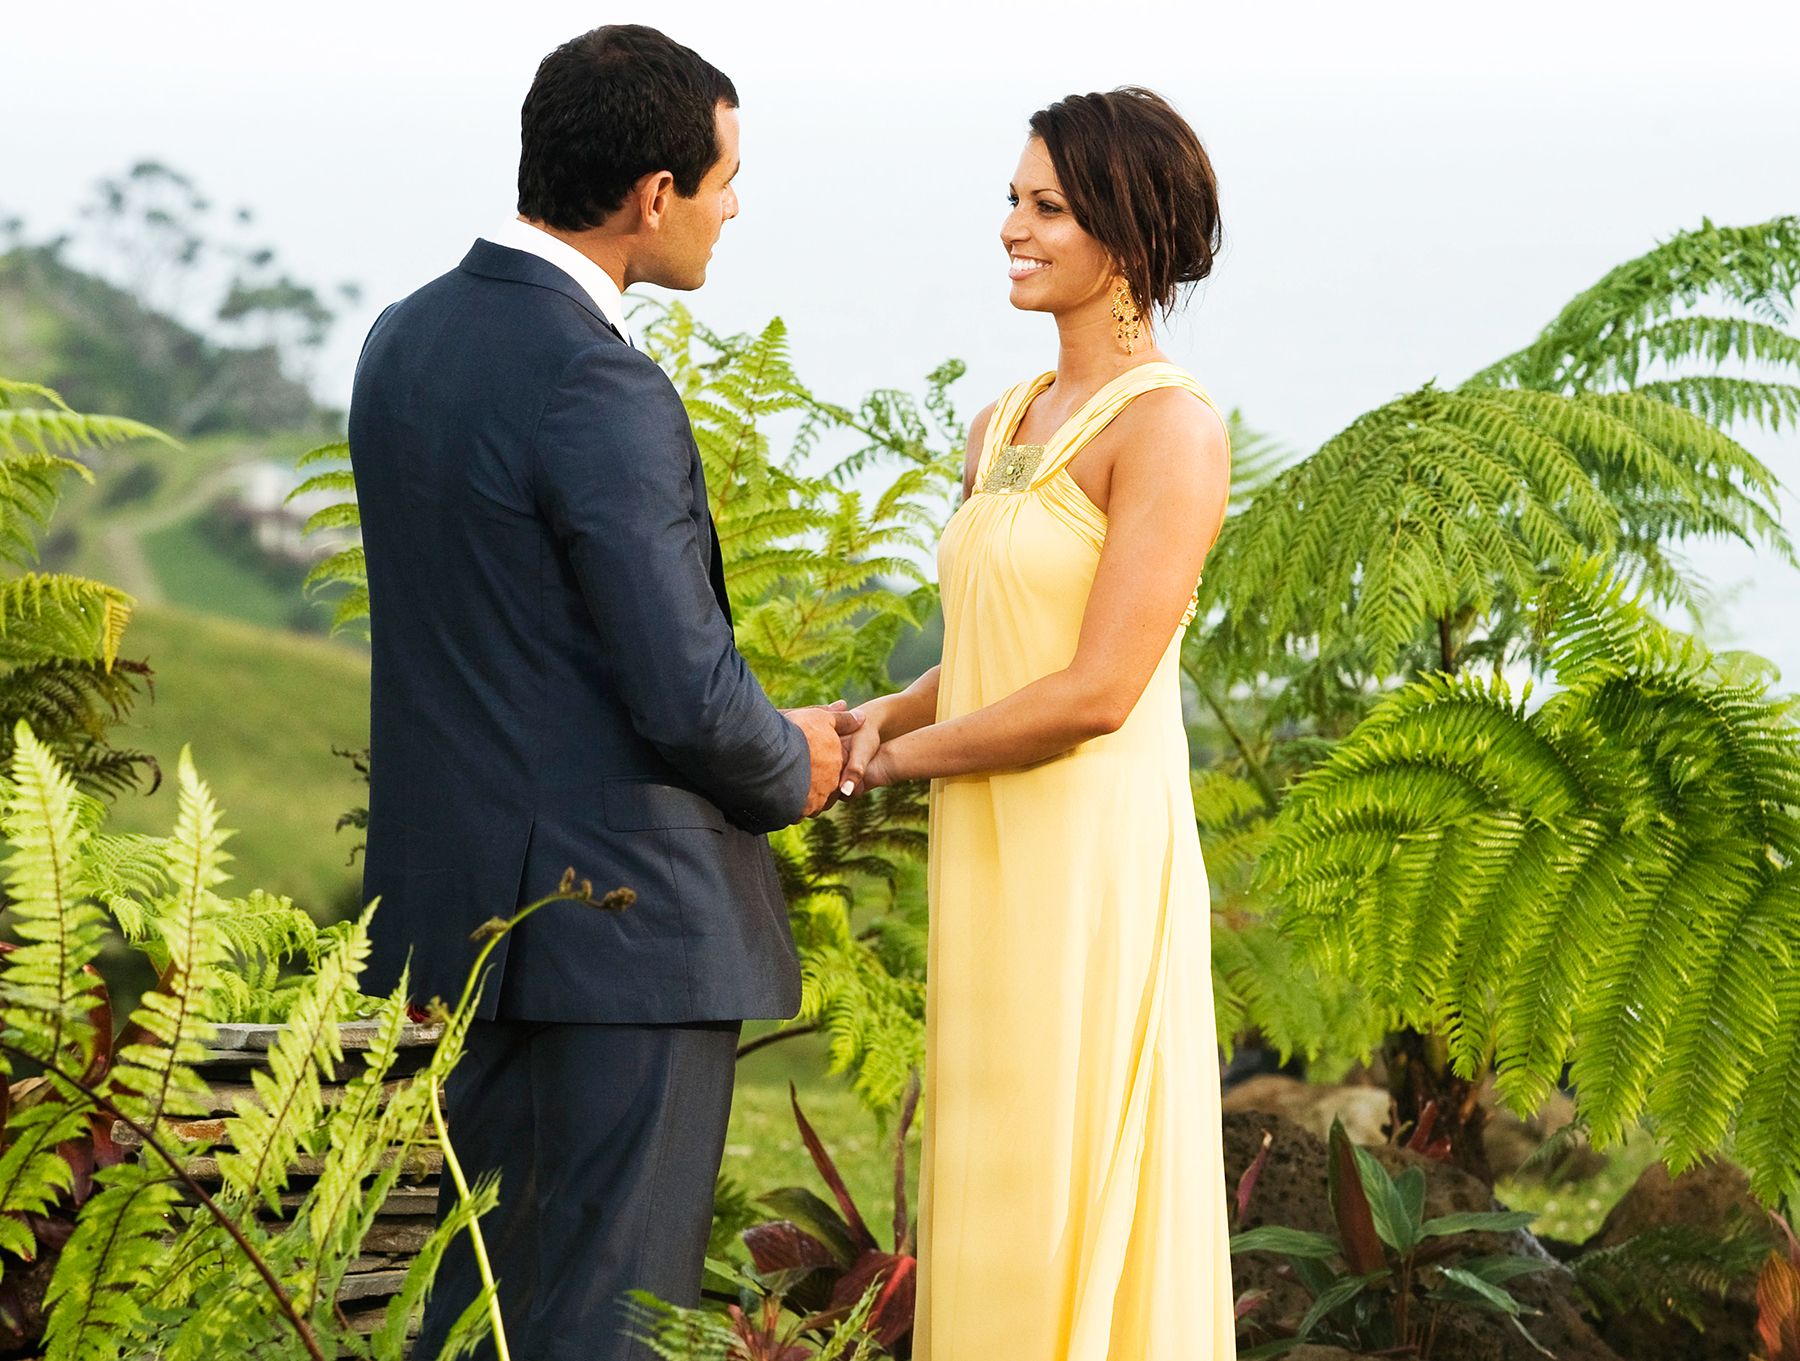 Jason Mesnick Melissa Rycroft The Bachelor